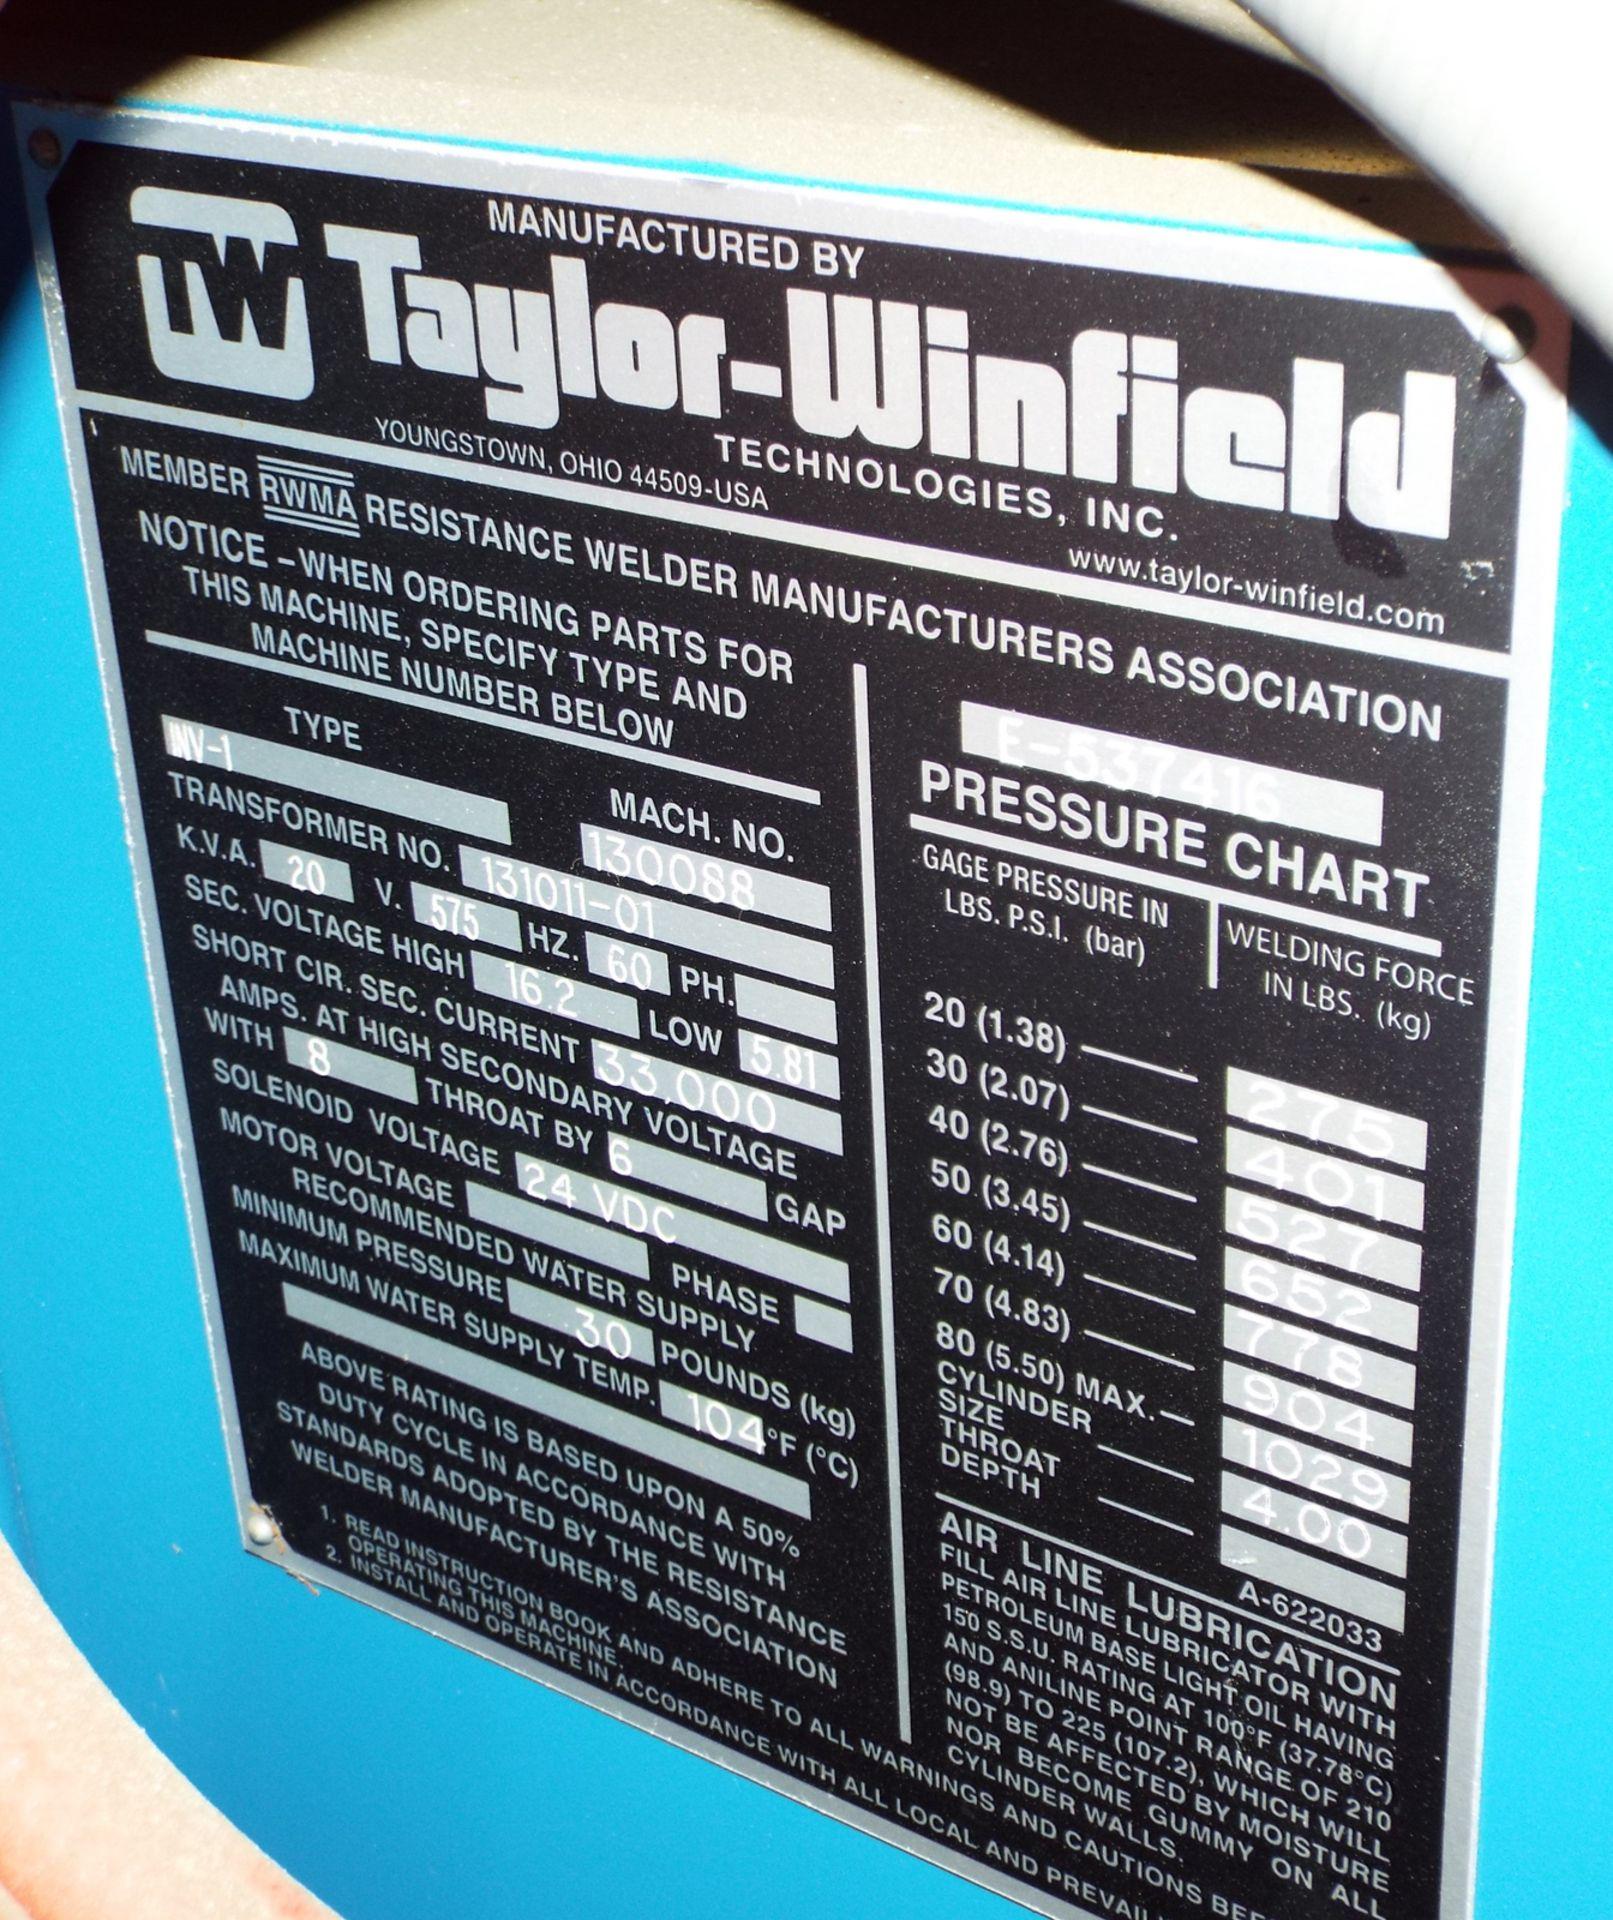 "Lot 12 - TAYLOR WINFIELD NV-1 SPOT WELDERS WITH UNITROL SOLUTION DIGITAL CONTROL, 20 KVA, 575V, 8"" THROAT, 6"""